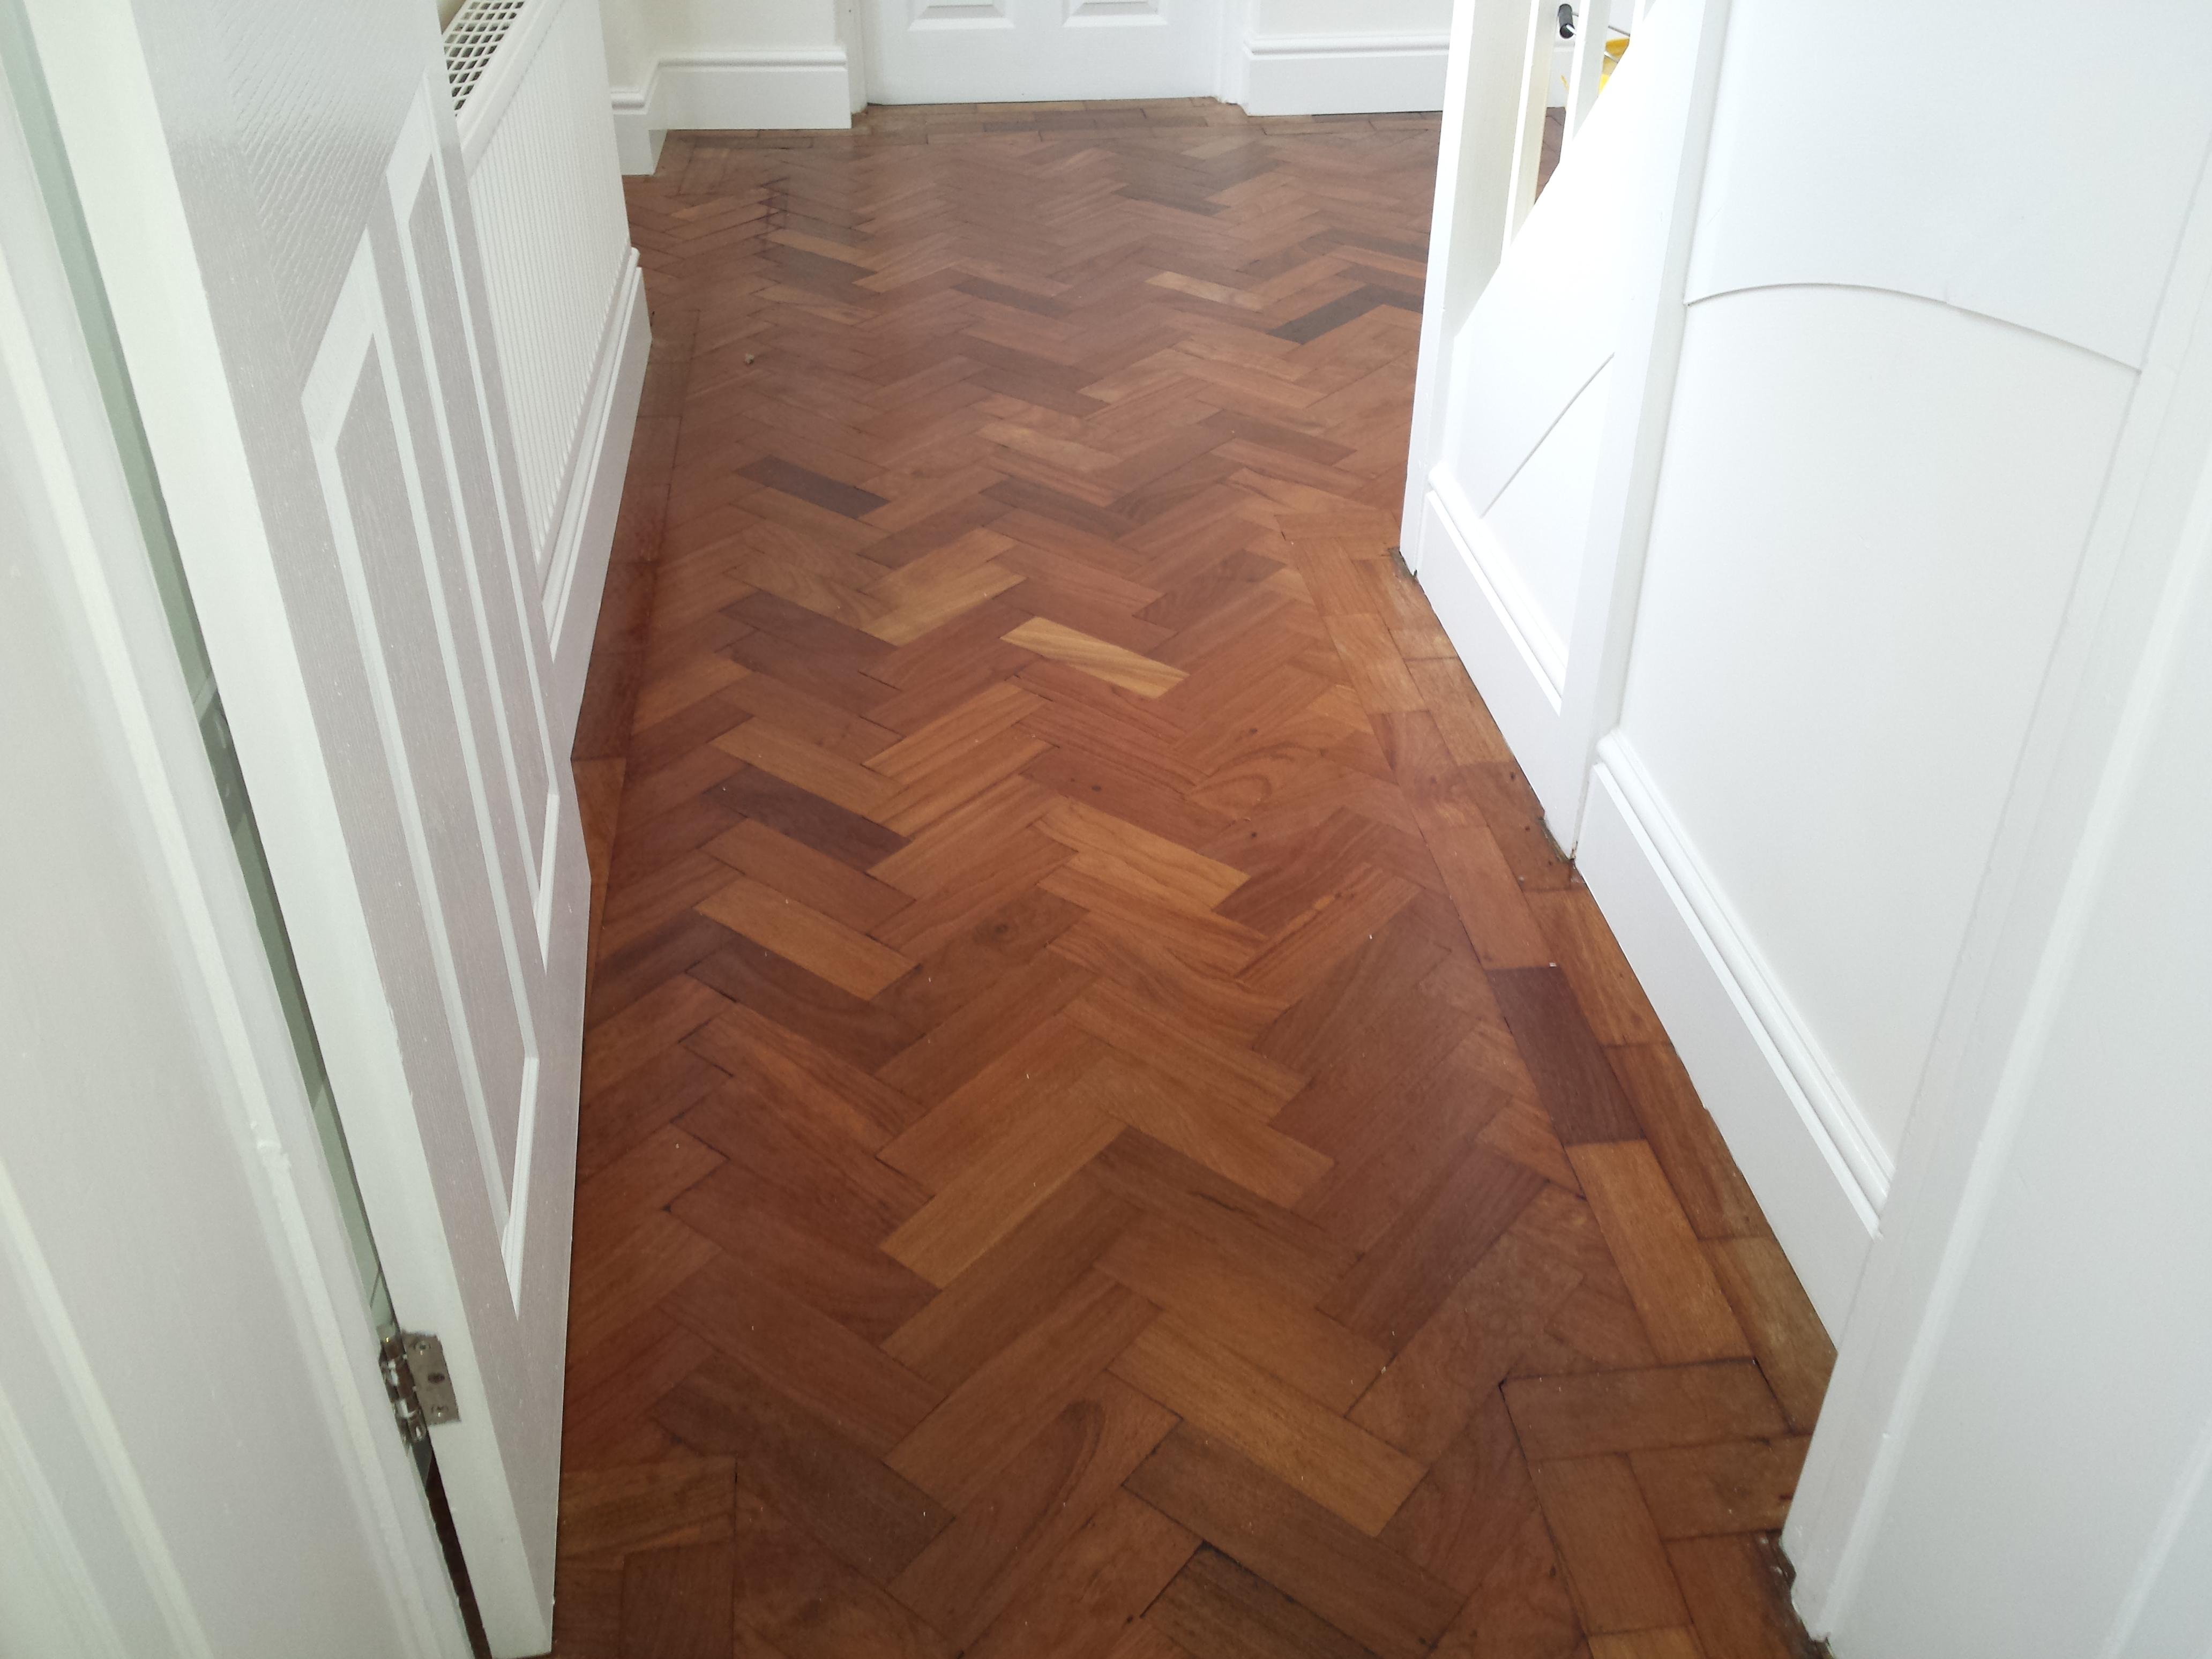 floor texture brown stain en parquet wooden hardwood structure wood photo wallpaper images flooring free pattern laminate planks